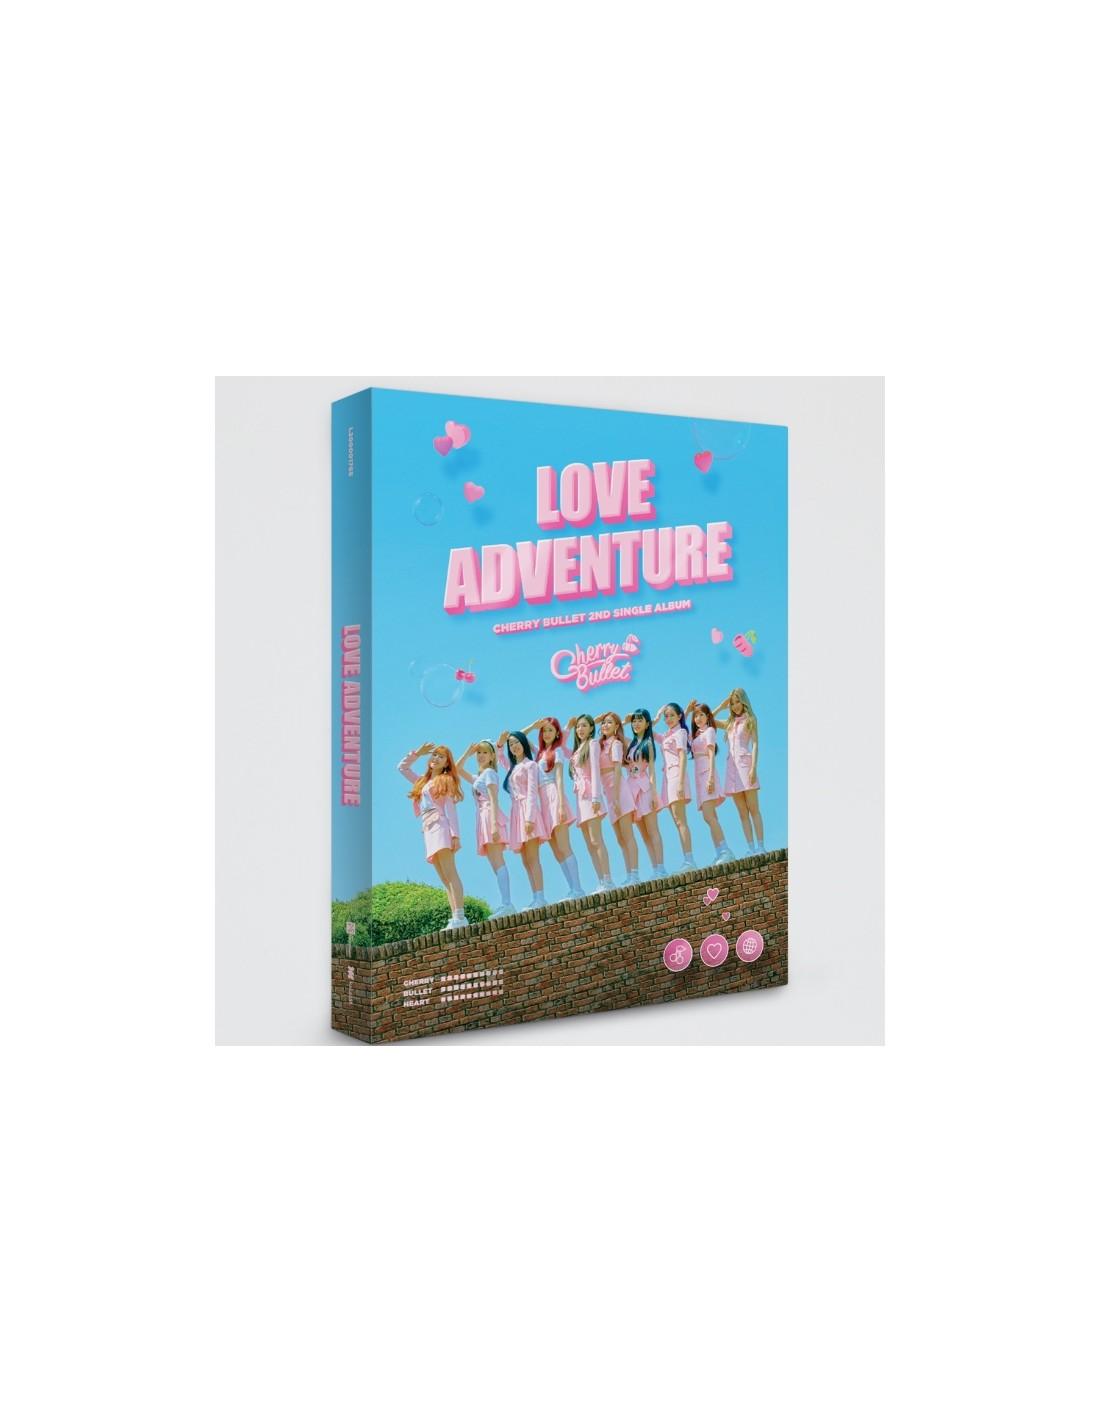 Cherry Bullet 2nd Single Album - LOVE ADVENTURE CD + Poster